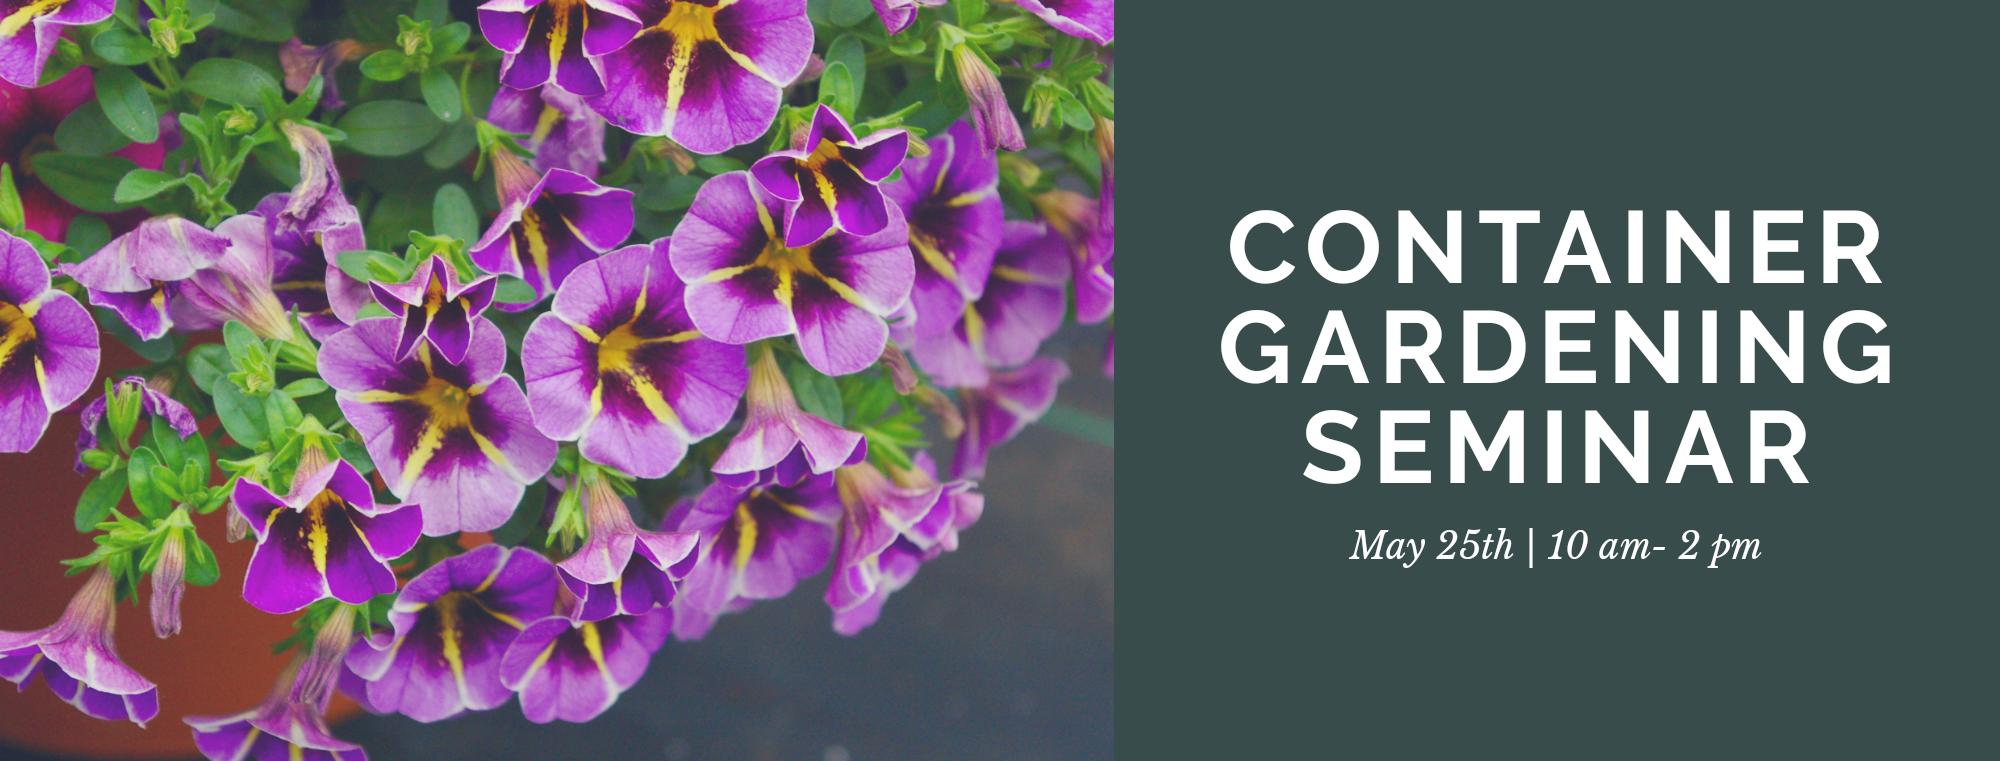 Gallery- Sailer's Greenhouse